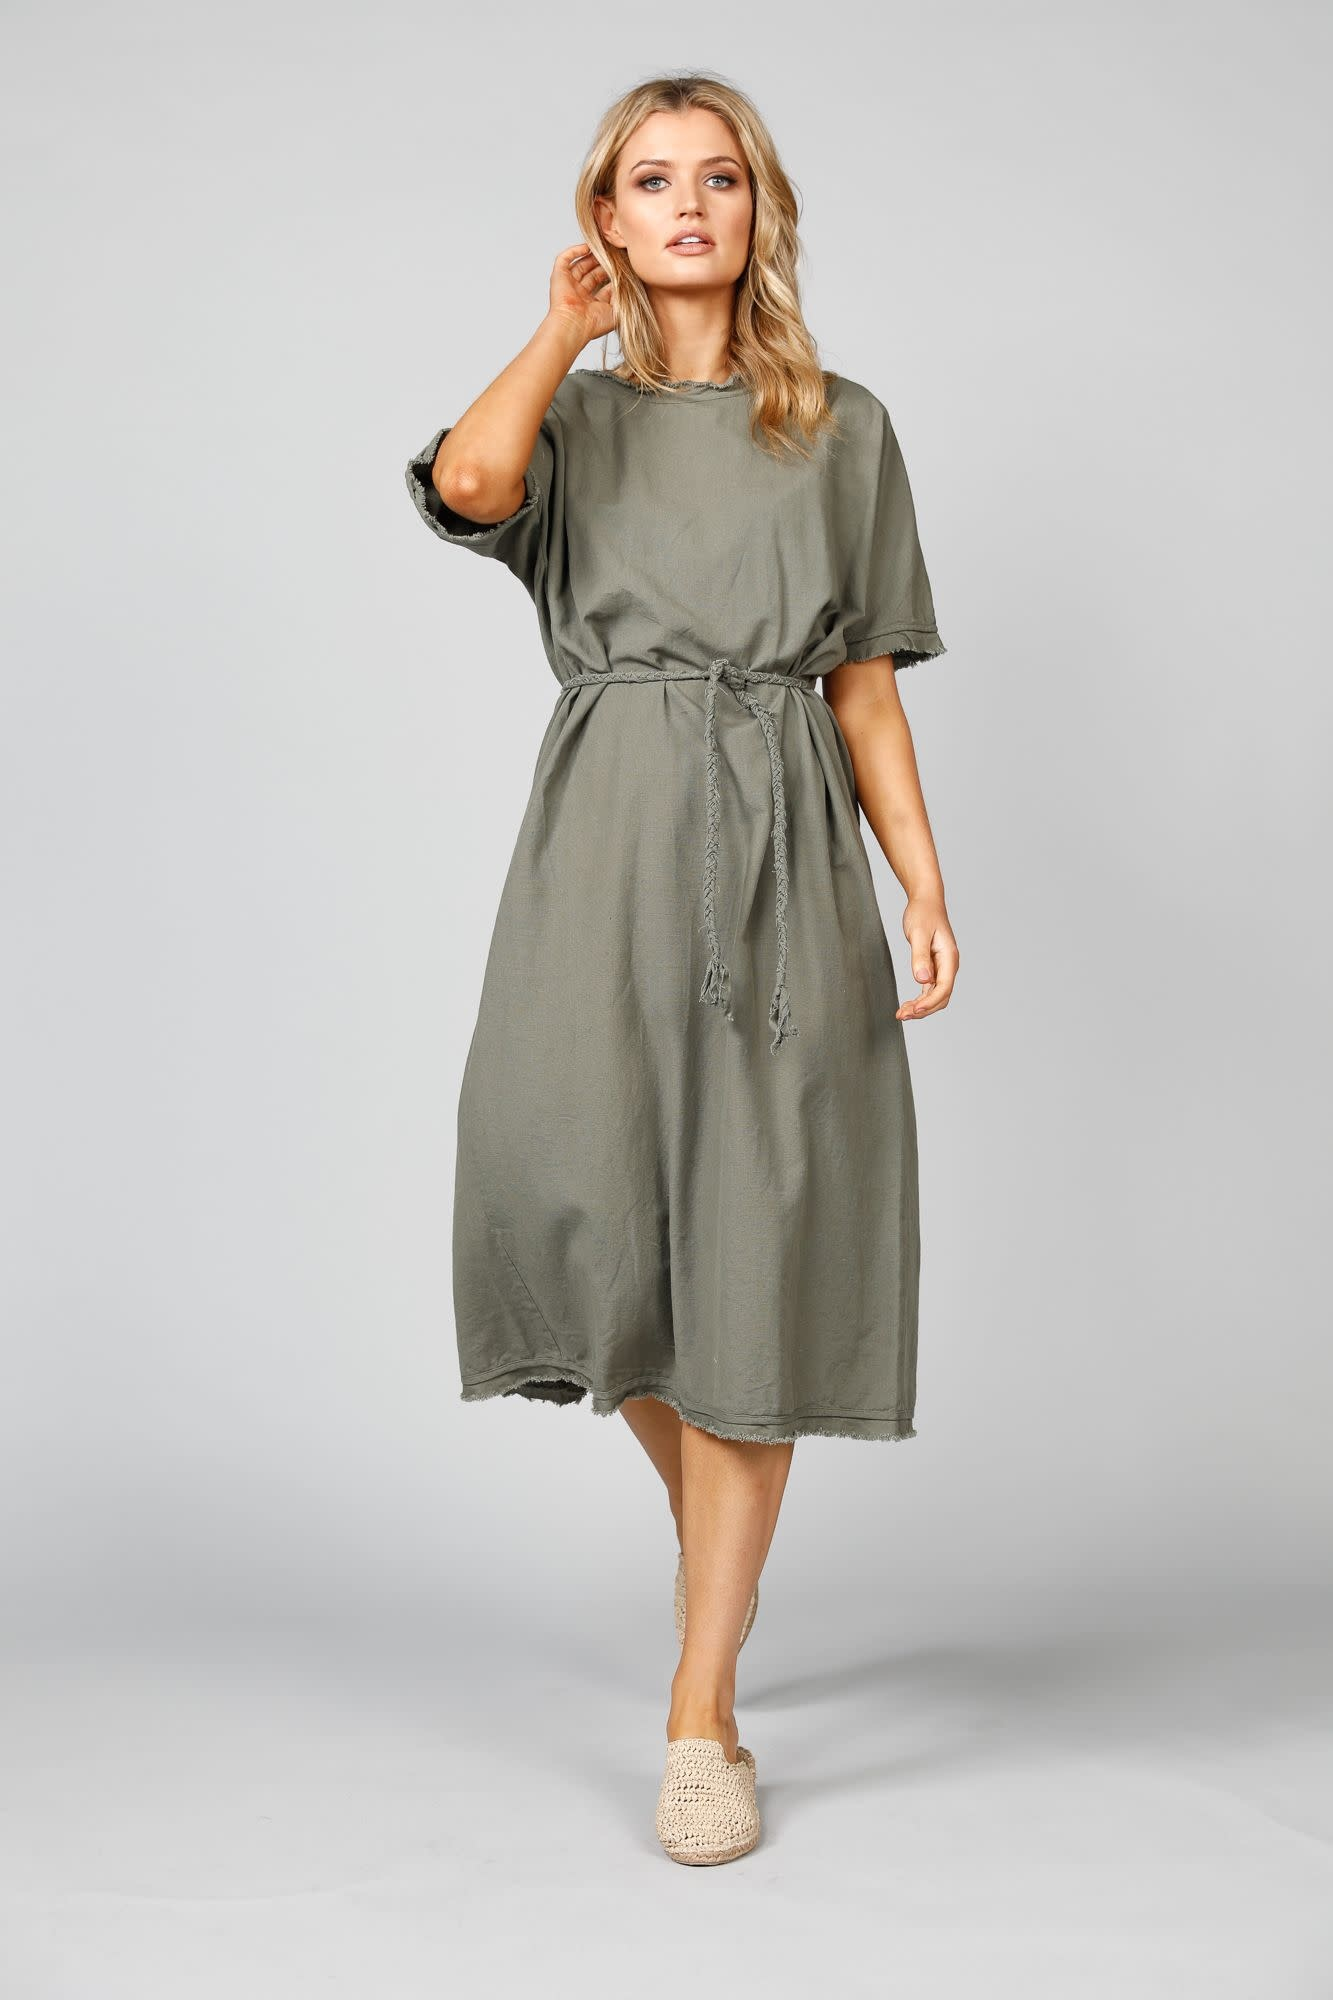 Shanty Tuscan Dress